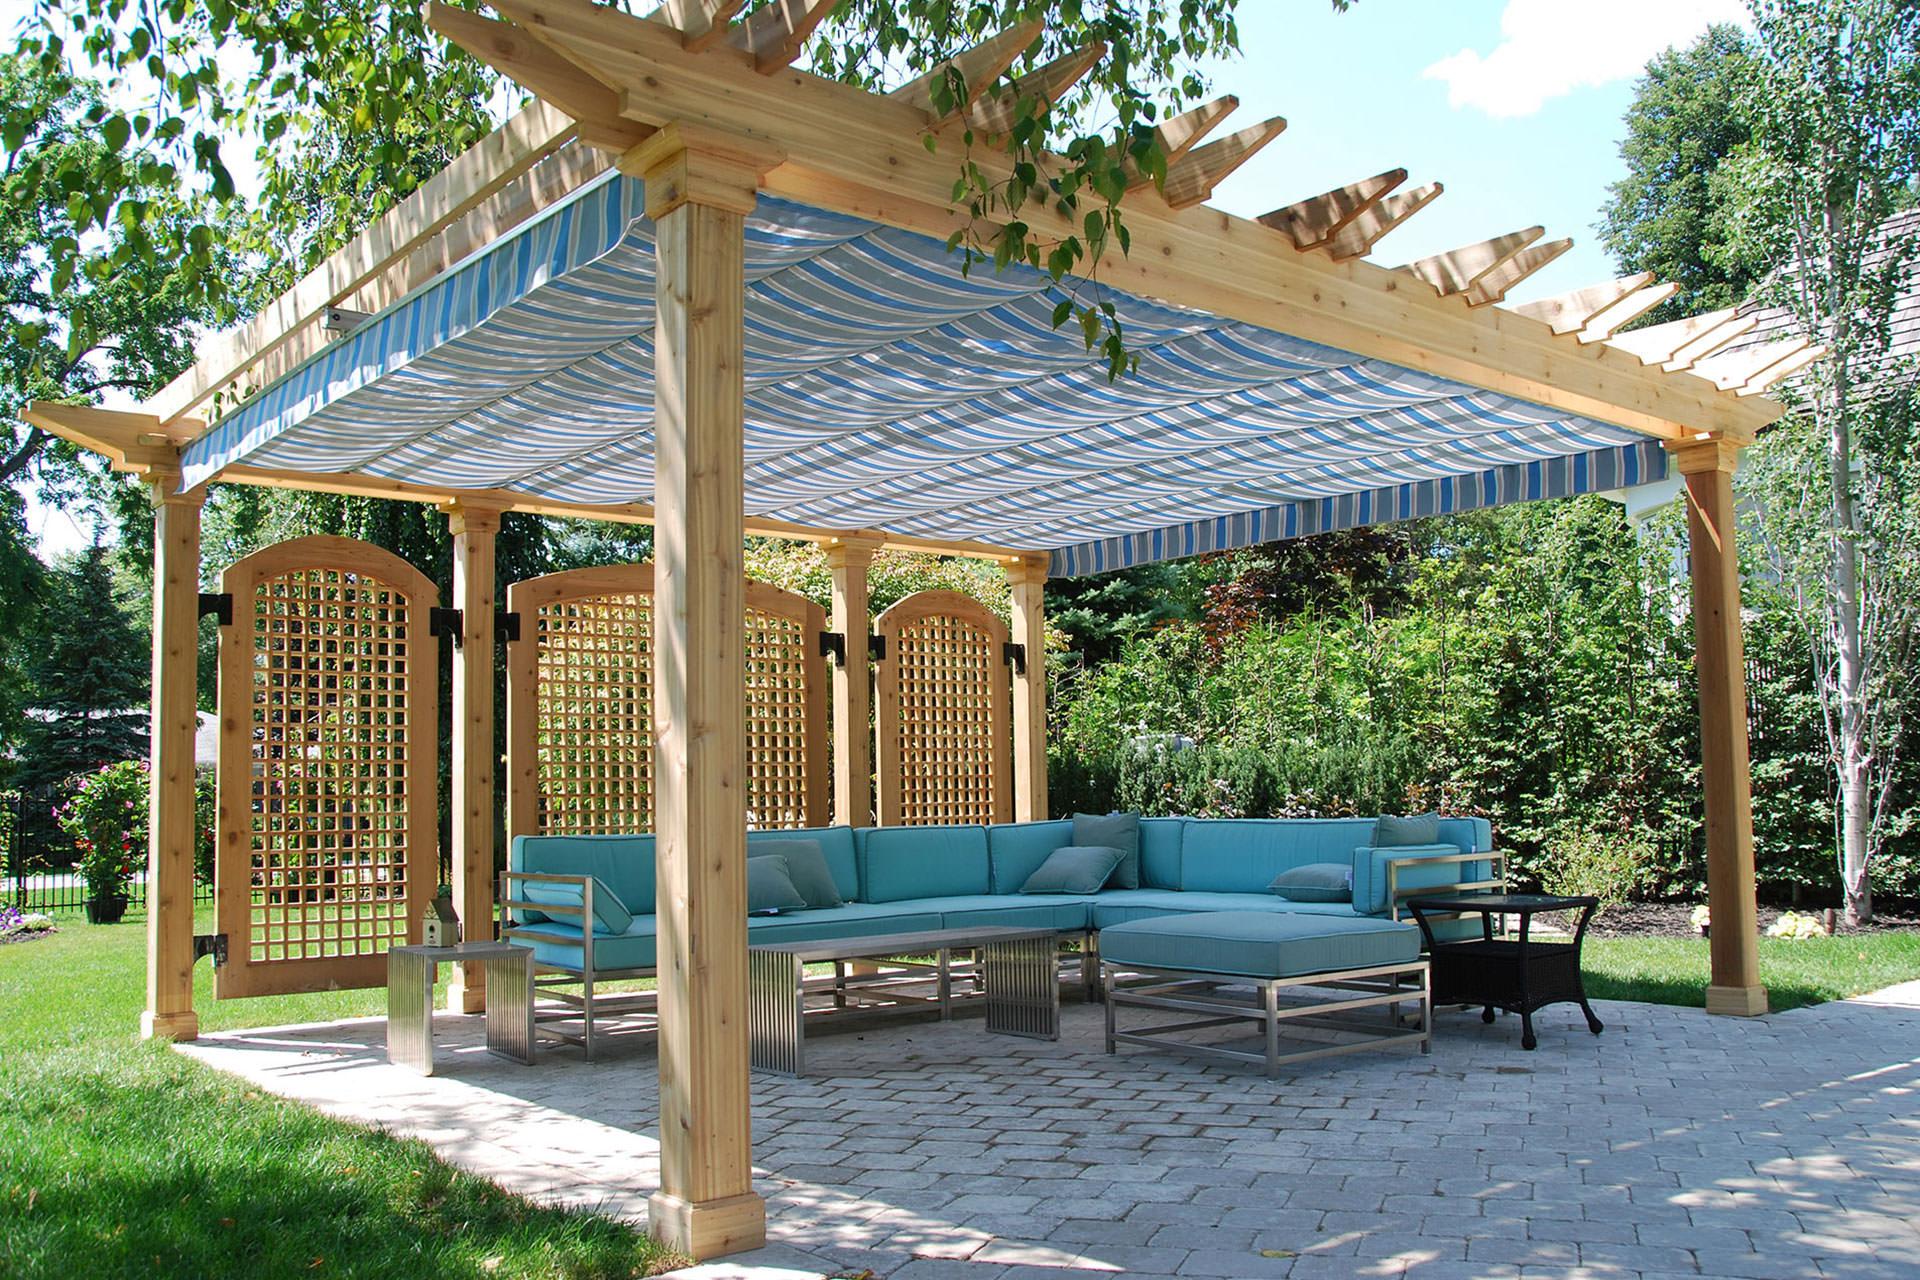 Retractable Pergola Canopy in Oakville | ShadeFX Canopies on Canvas Sun Shade Pergola id=29363